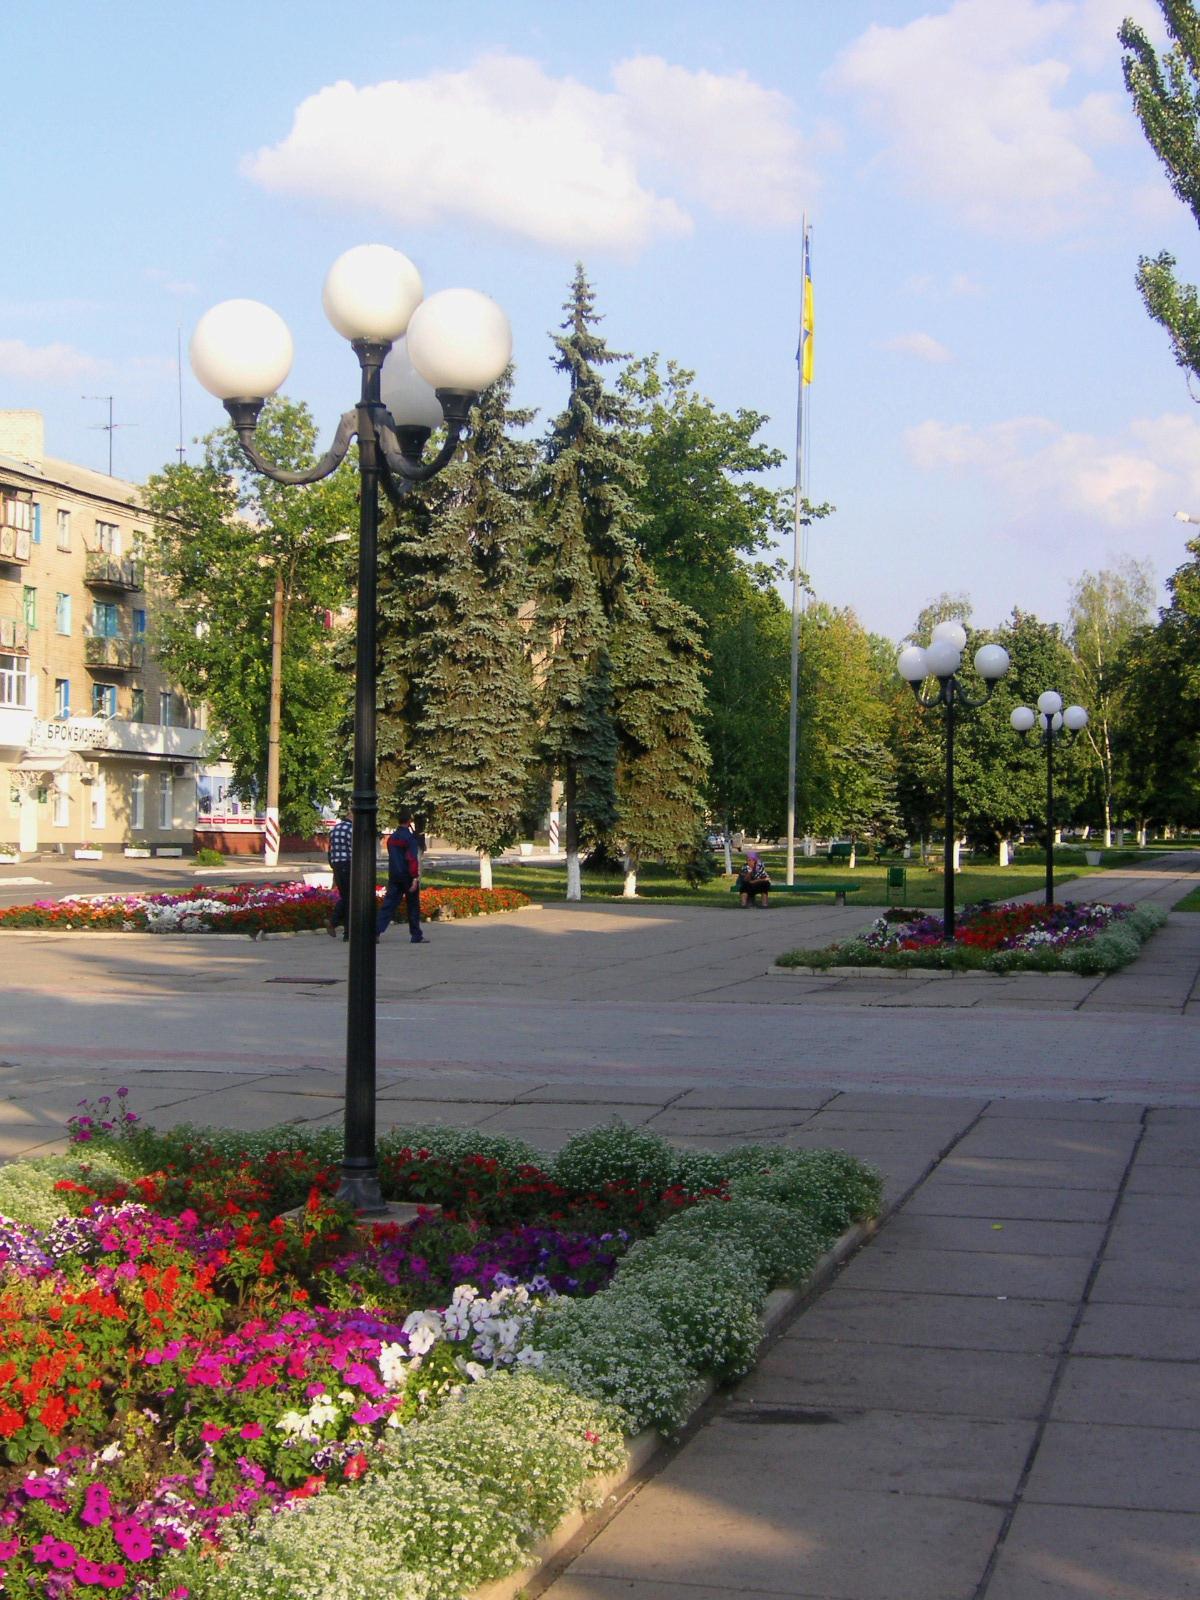 Kyiv travel | Ukraine - Lonely Planet